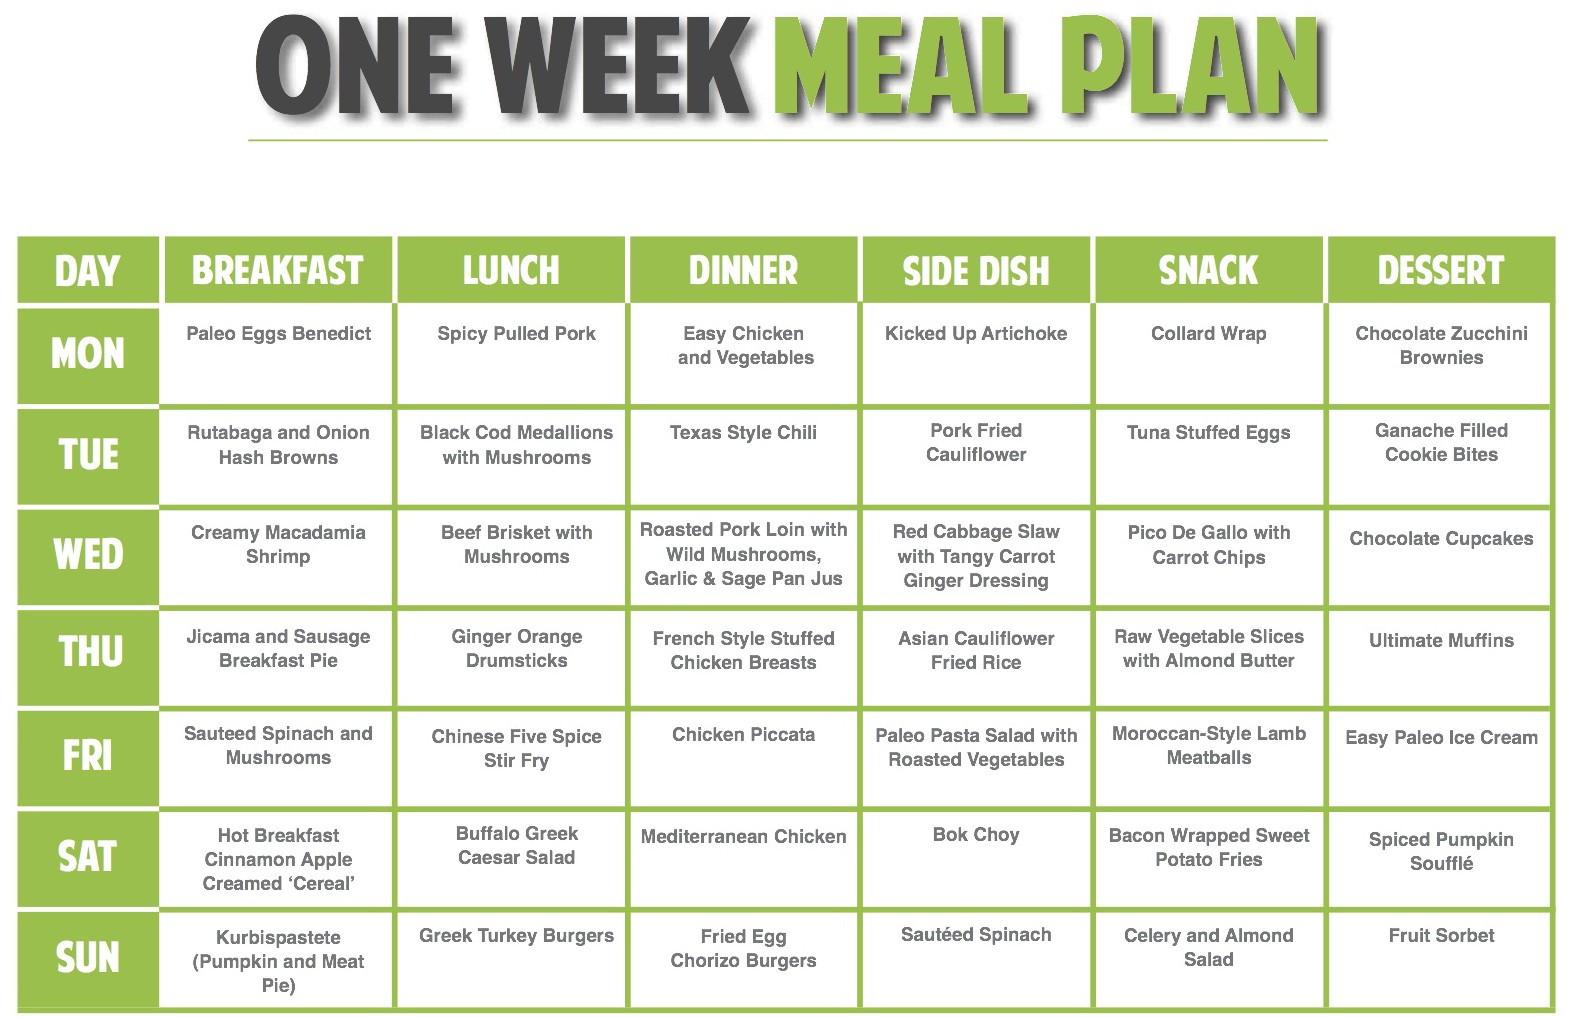 Healthy Vegan Plan  Vegan Meal Nutrition Guide Archives Vegan Meal Plan